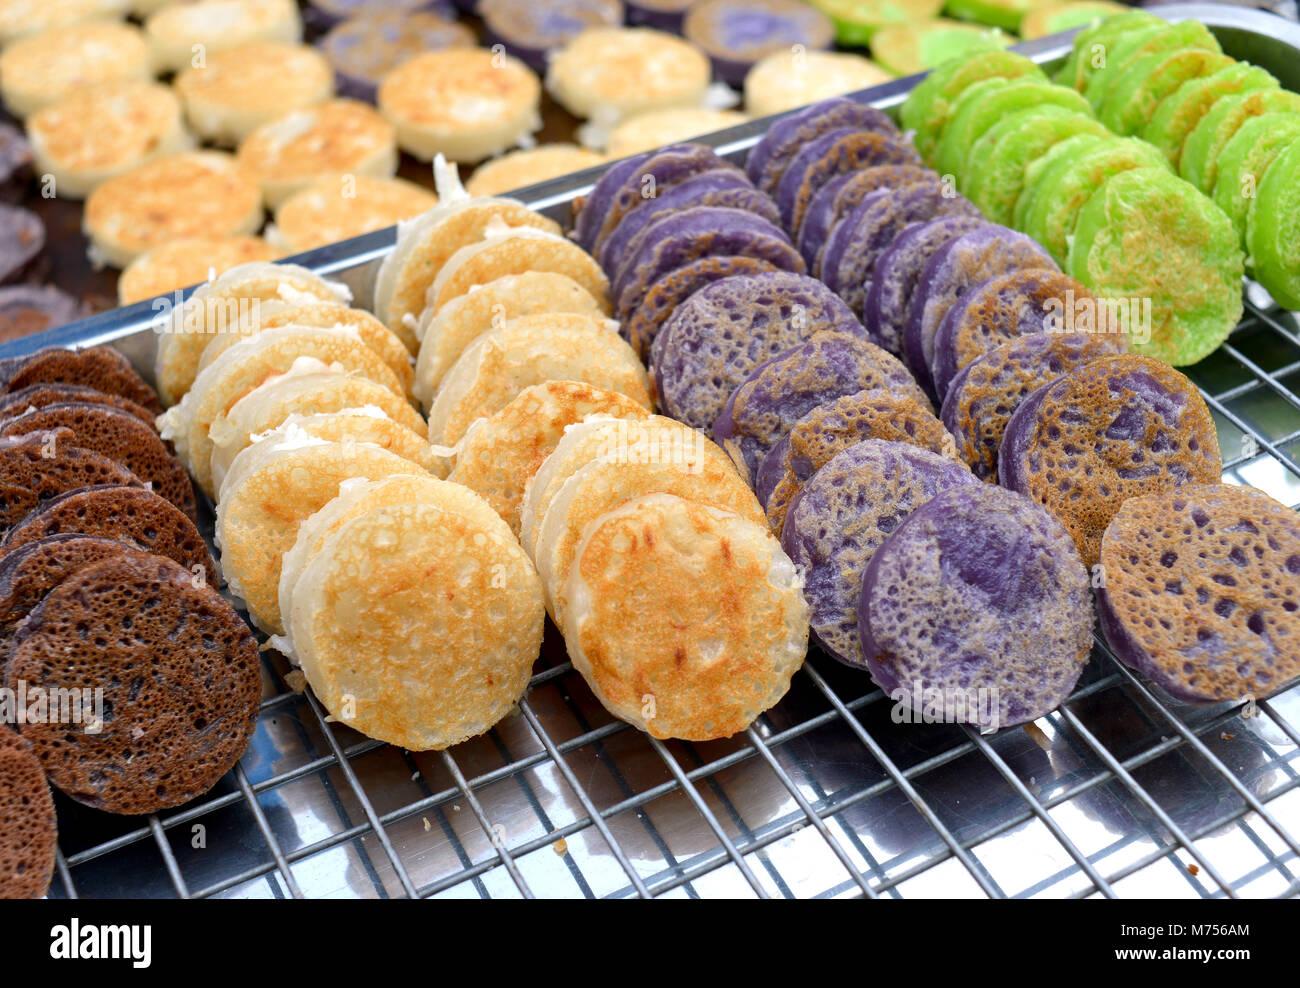 Babin candy is Thai style street coconut sweet pancake ,the old thai dessert in outdoor under umbrella lighting. - Stock Image